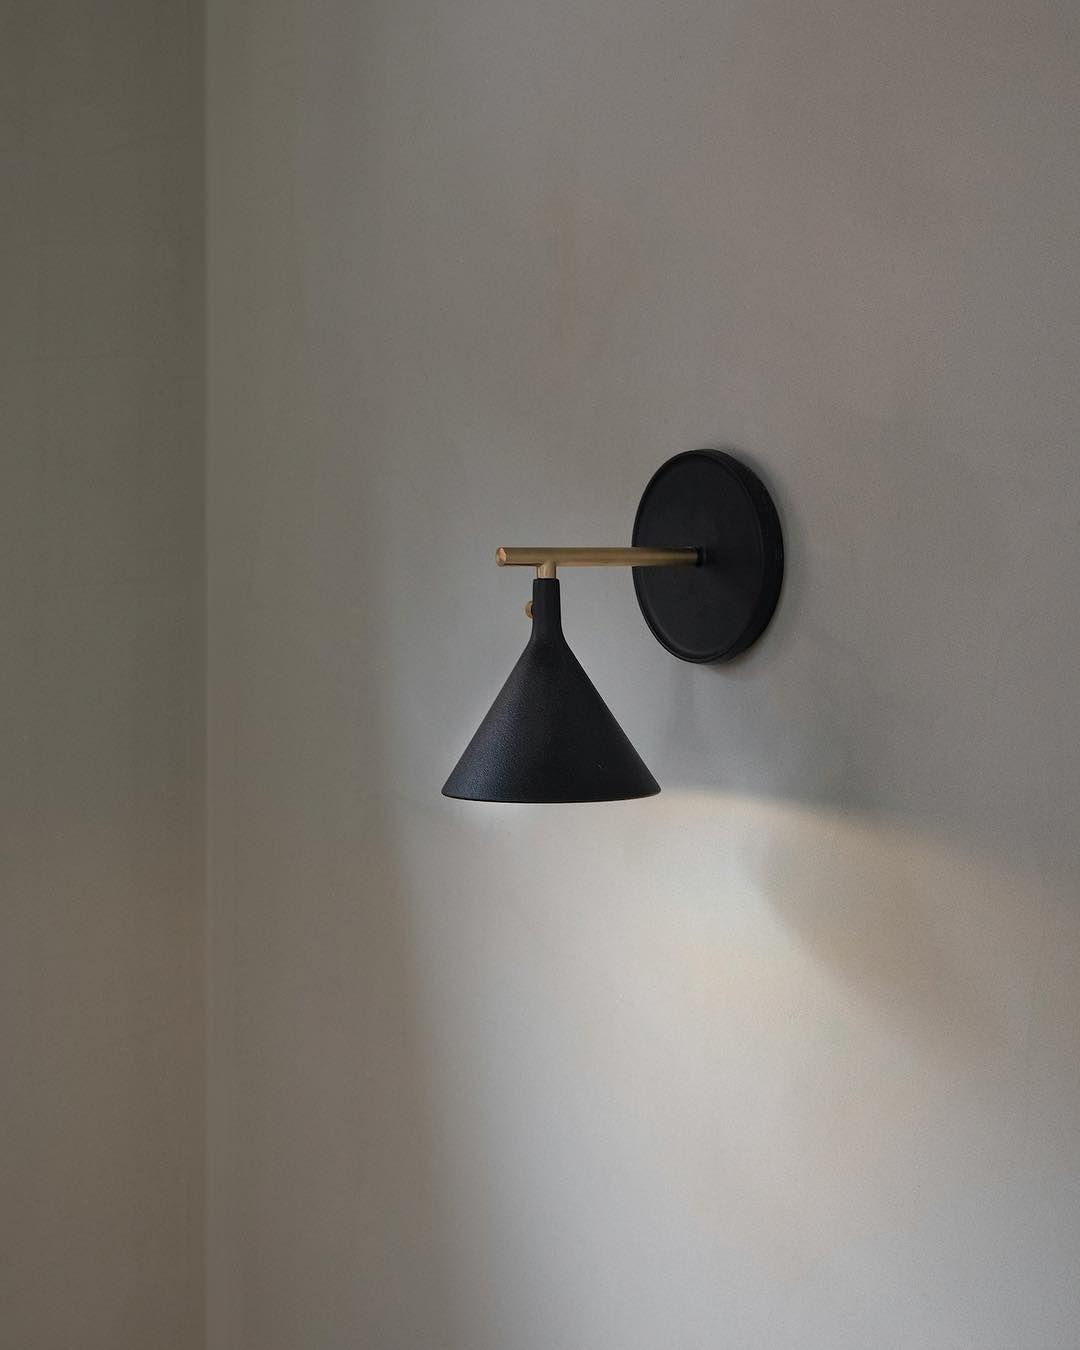 Menu Original Designer Furniture And Lighting At Olson Baker In 2020 Scandinavian Wall Lighting Wall Lights Lights